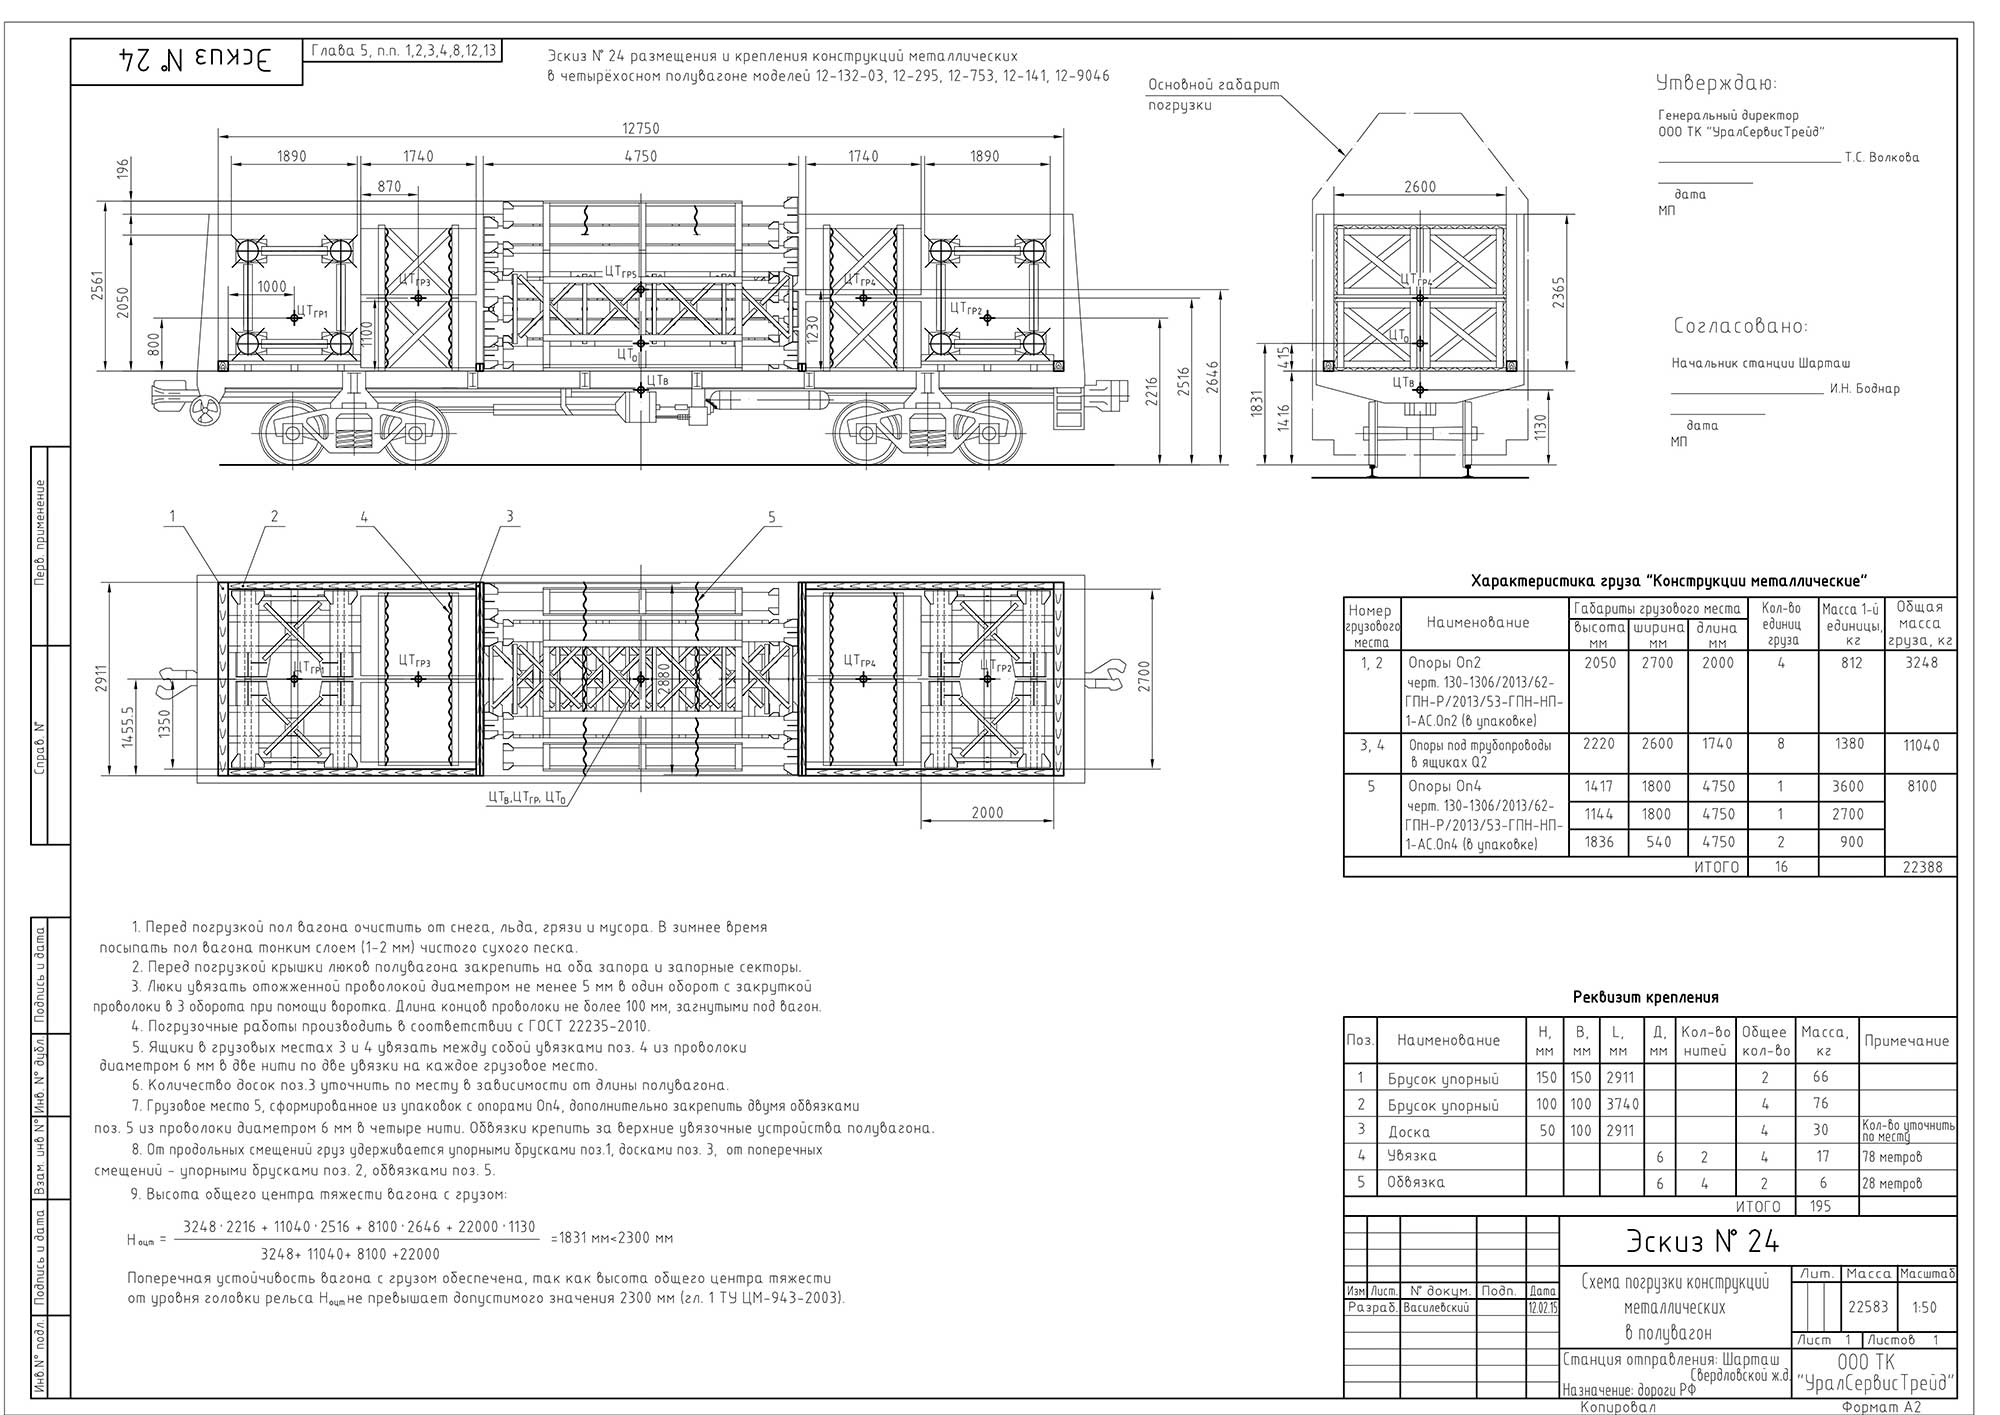 Схема загрузки в вагон